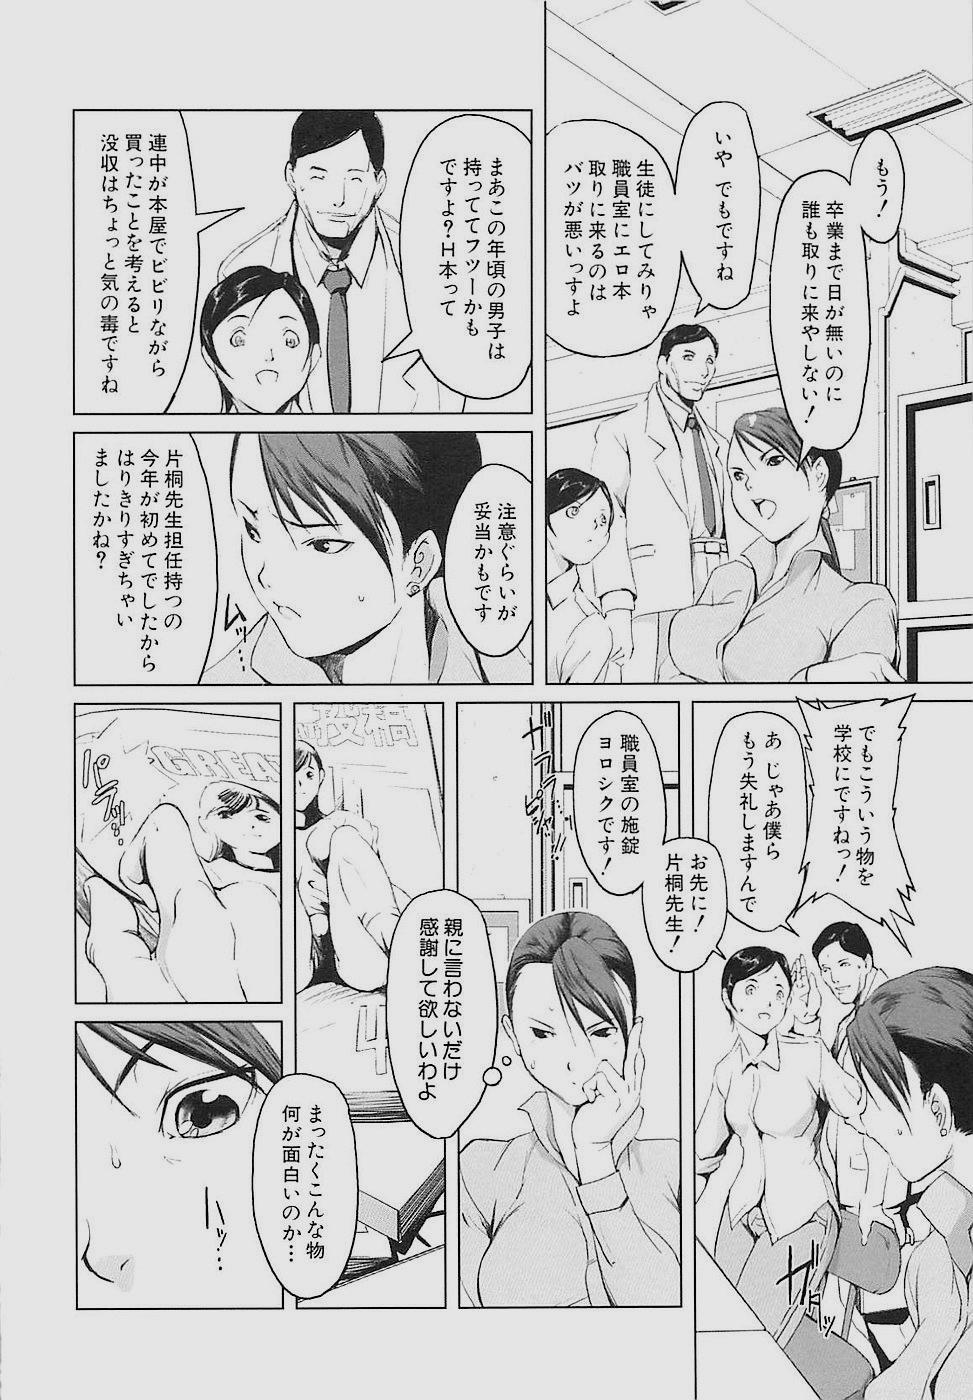 Inkoukamitsu 141